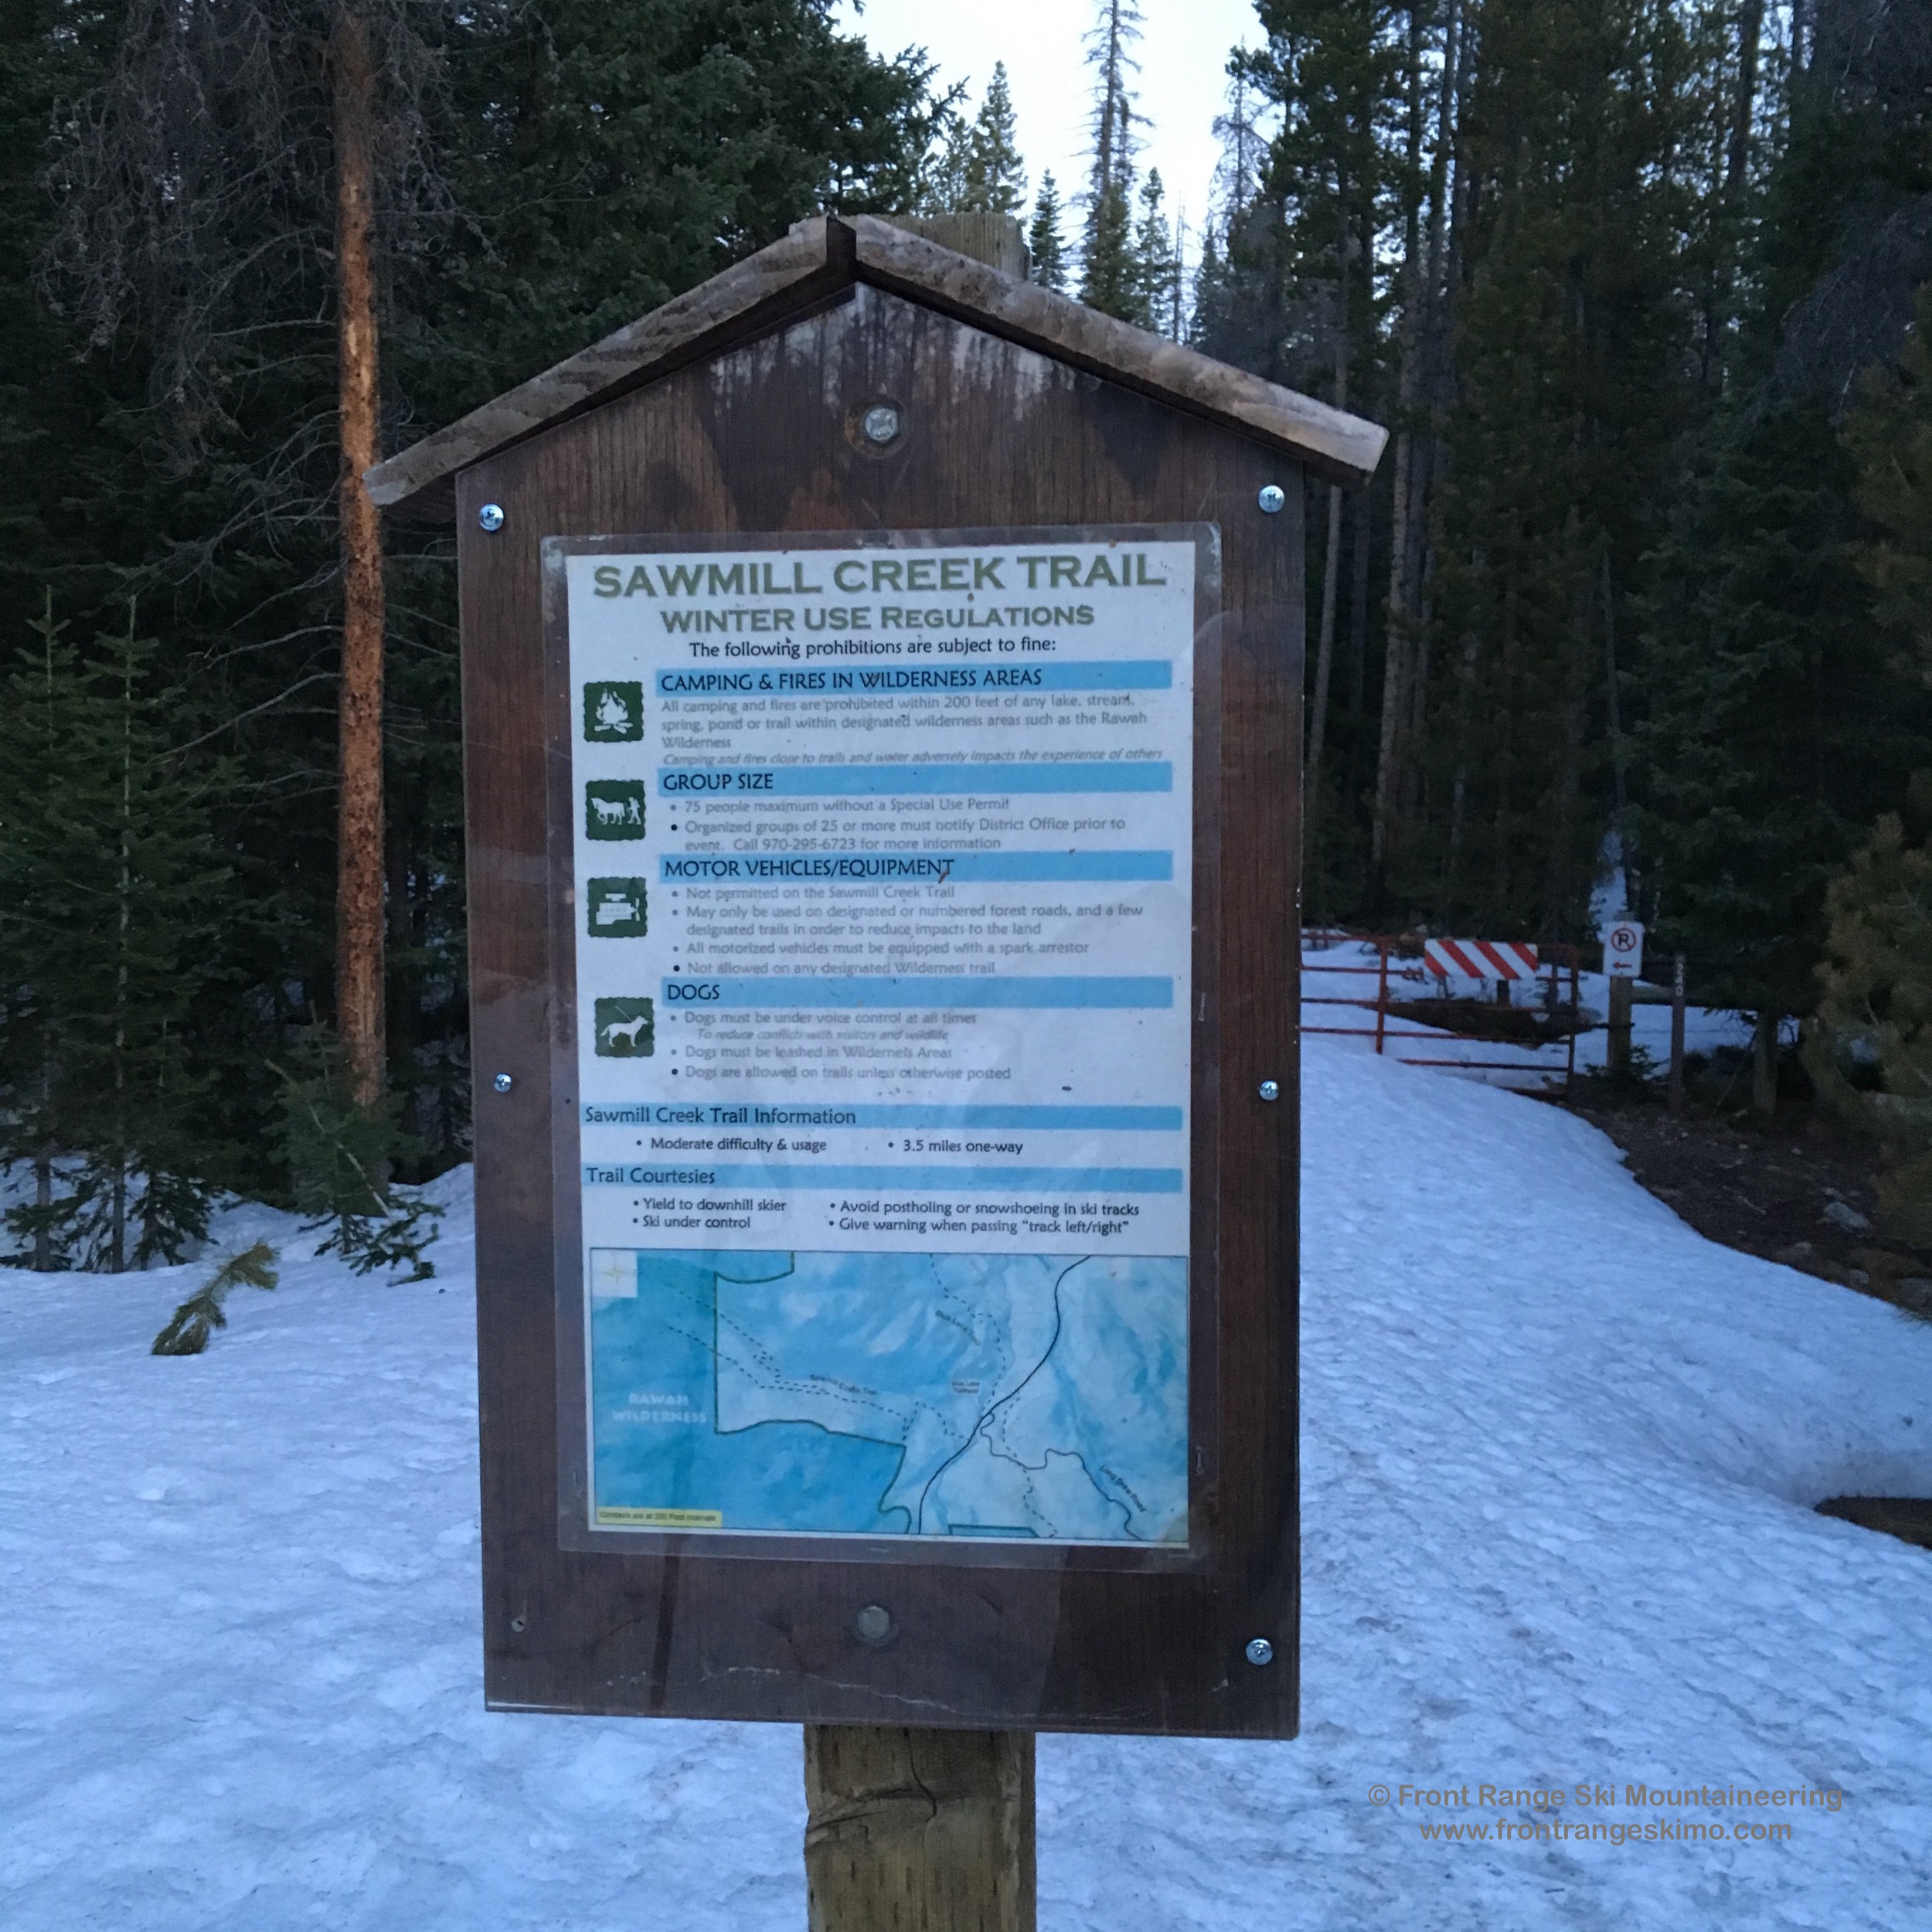 Sawmill Creek Trailhead is a brief hike up Highway 14 from Blue Lake Trailhead.